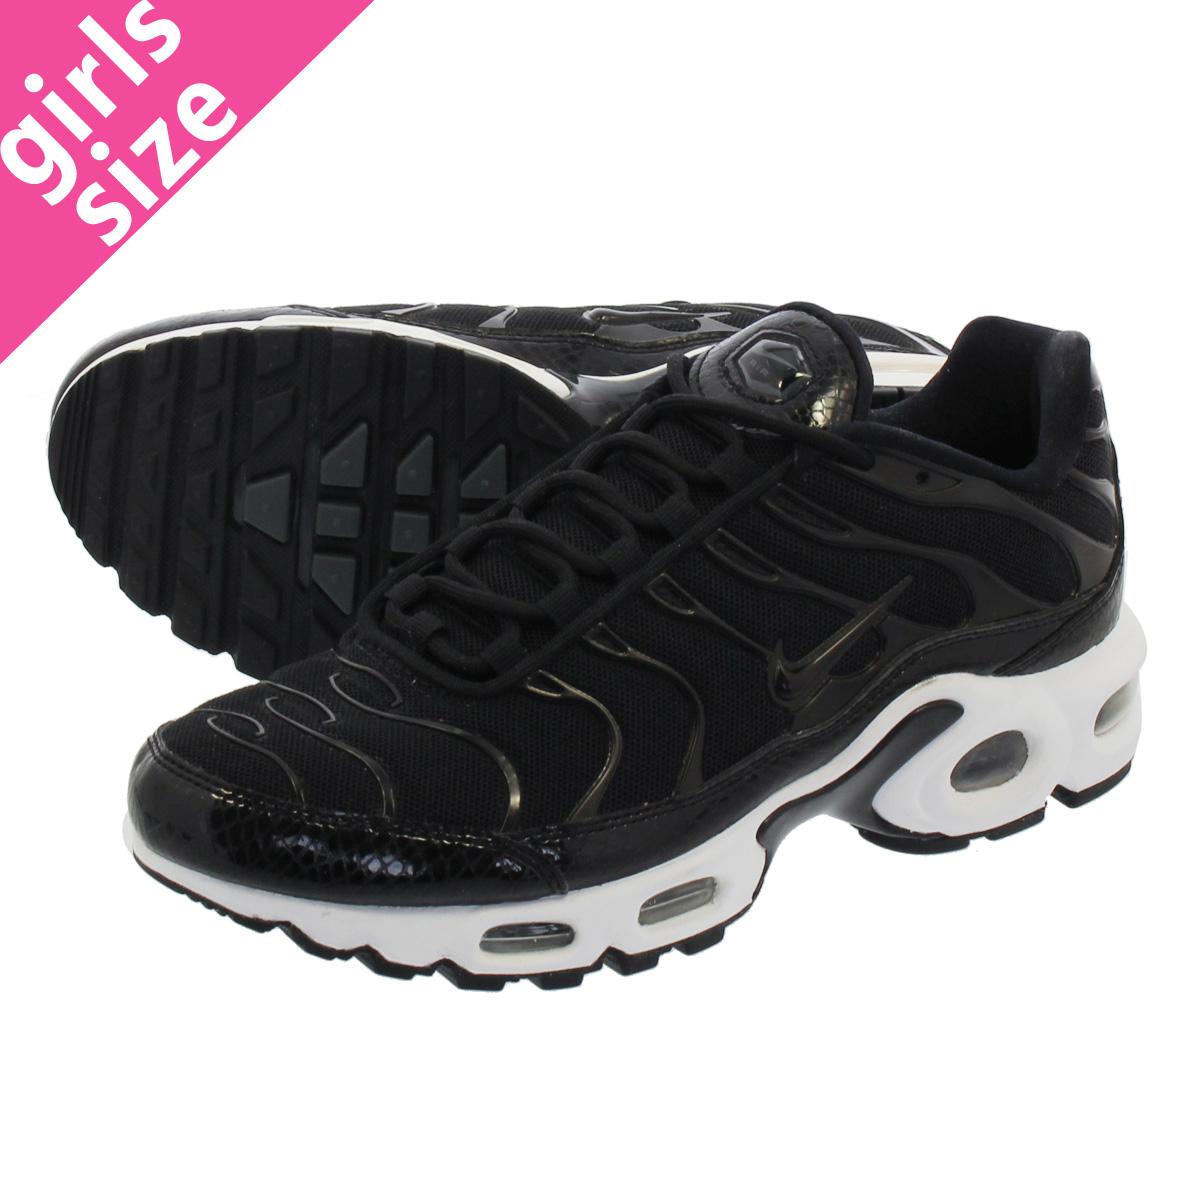 NIKE WMNS AIR MAX PLUS SE Nike women Air Max plus SE BLACKBLACKDARK GREY 862,201 004